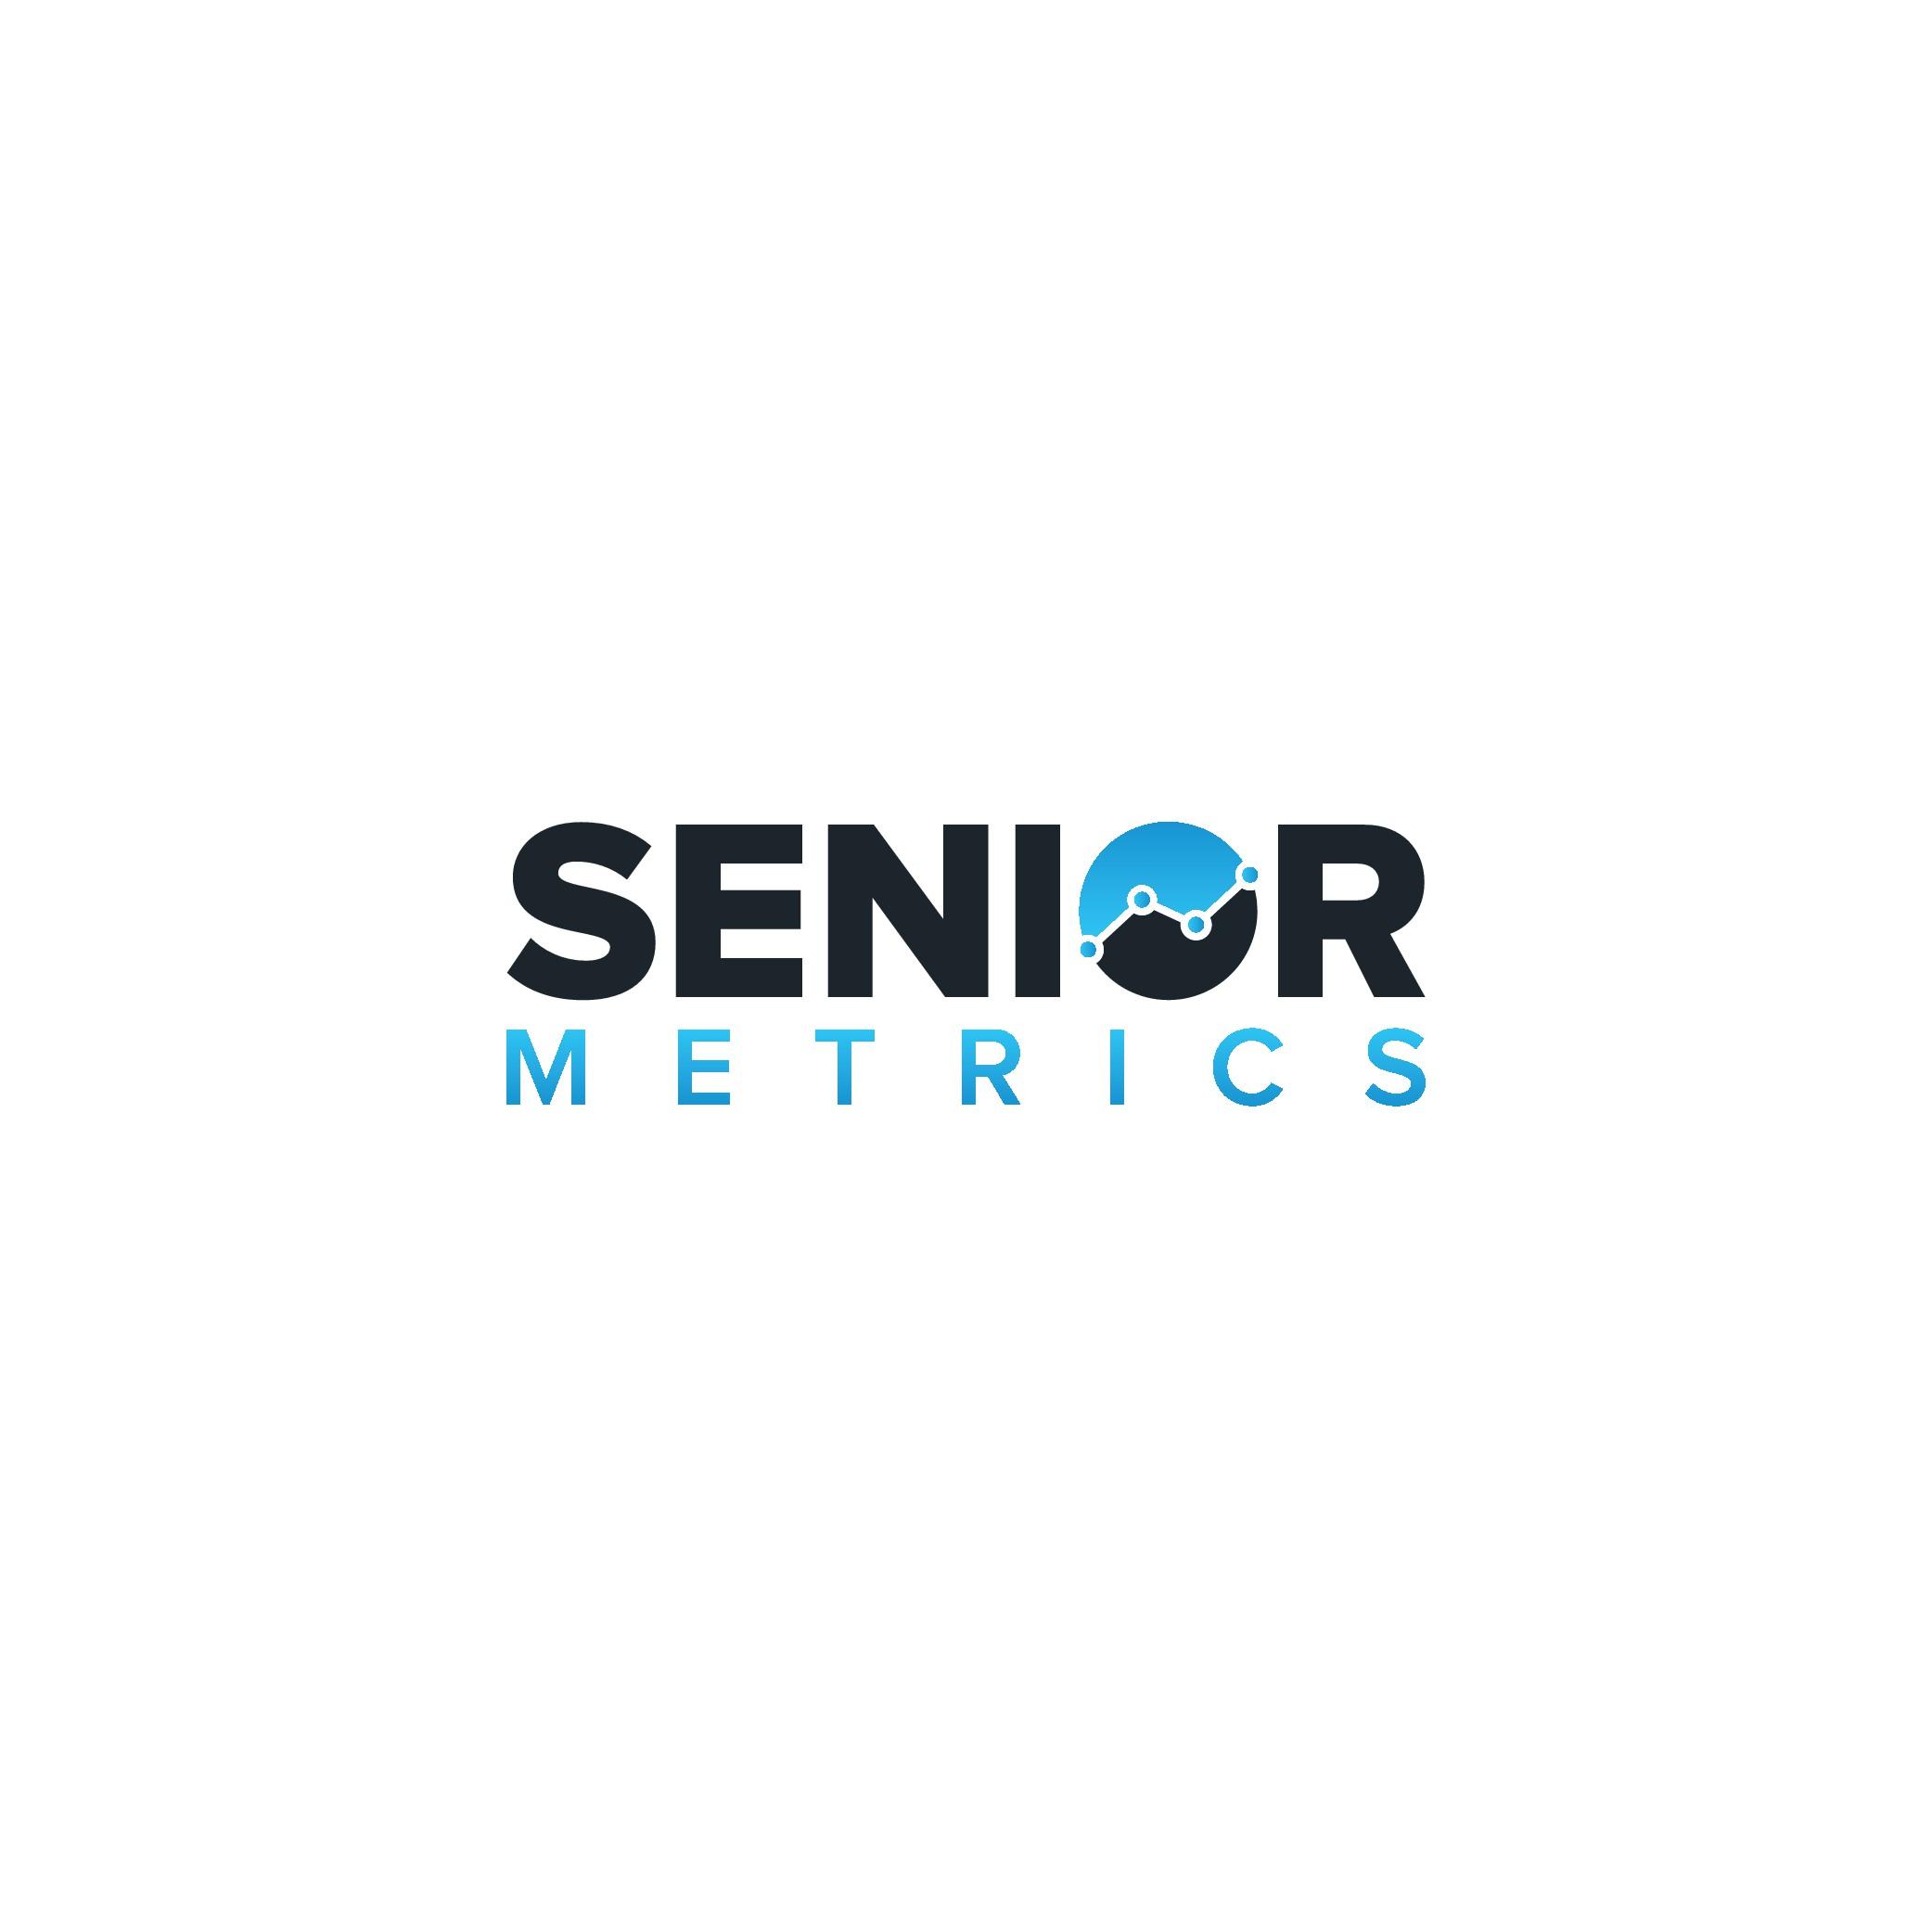 Save the Seniors! Data analytics firm for senior living needs a logo.